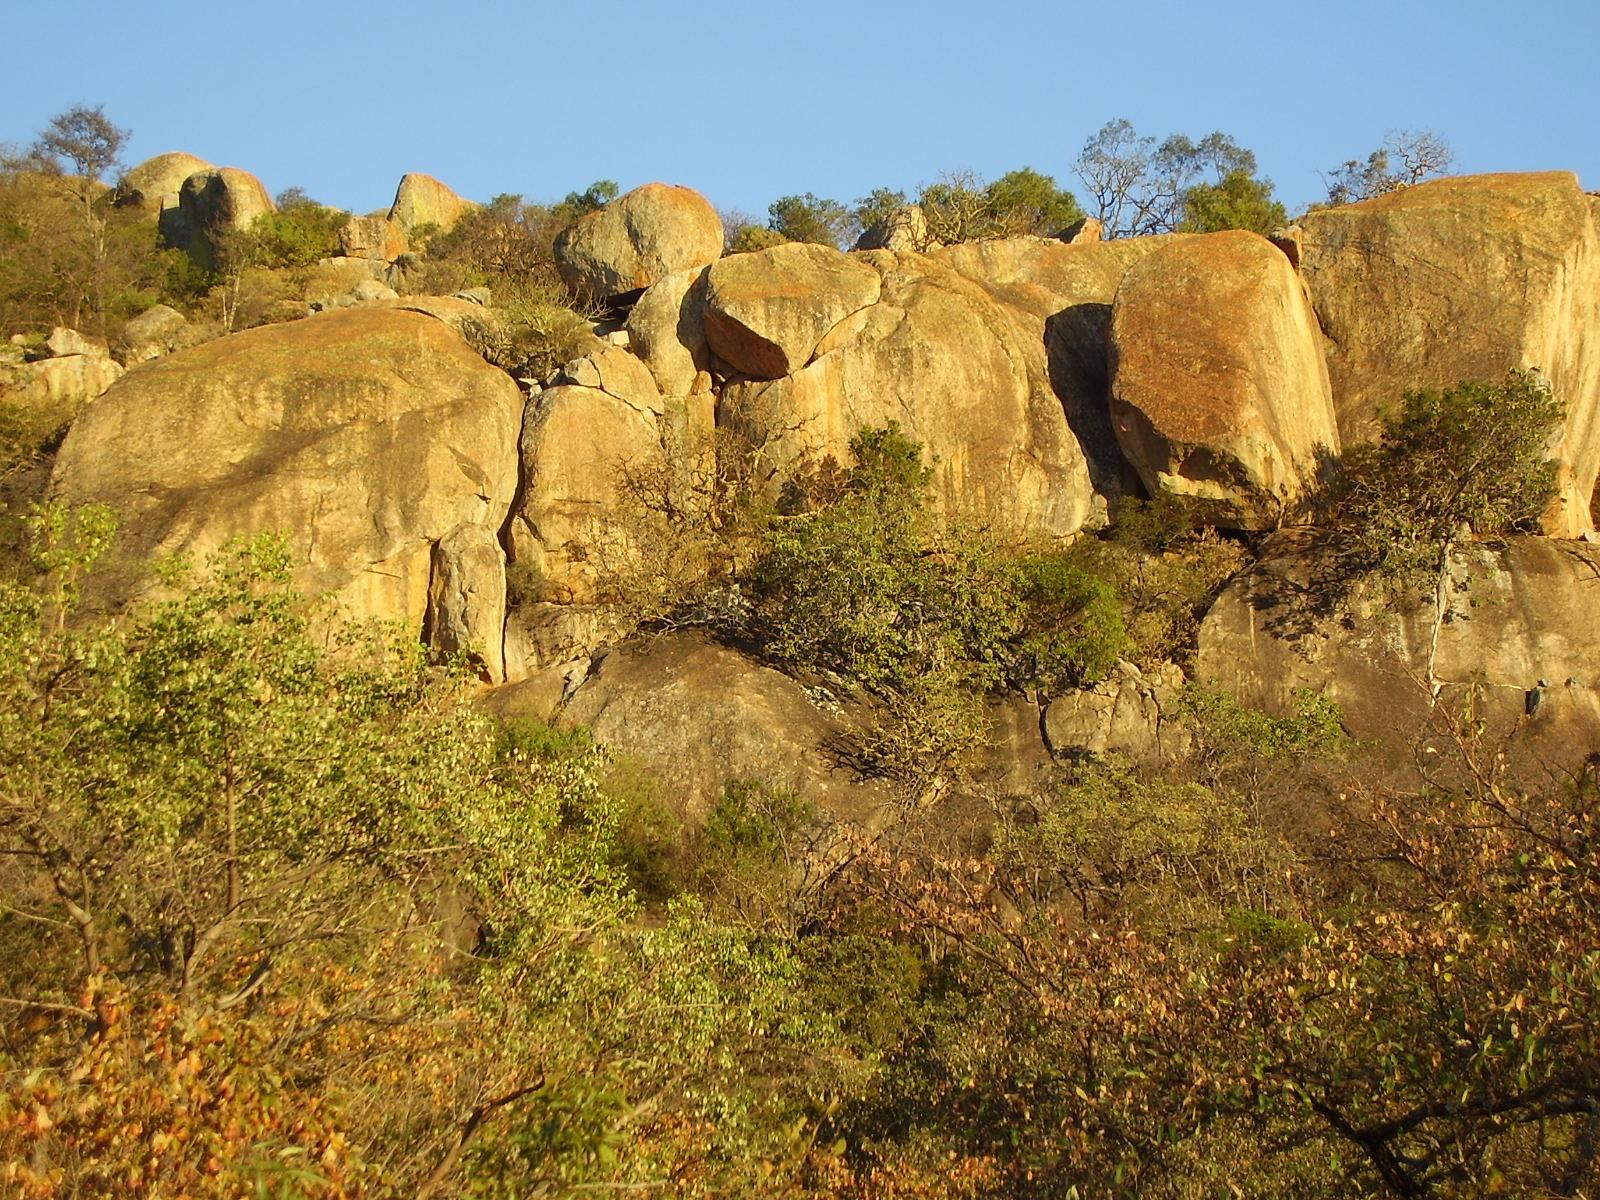 Matopos landscape